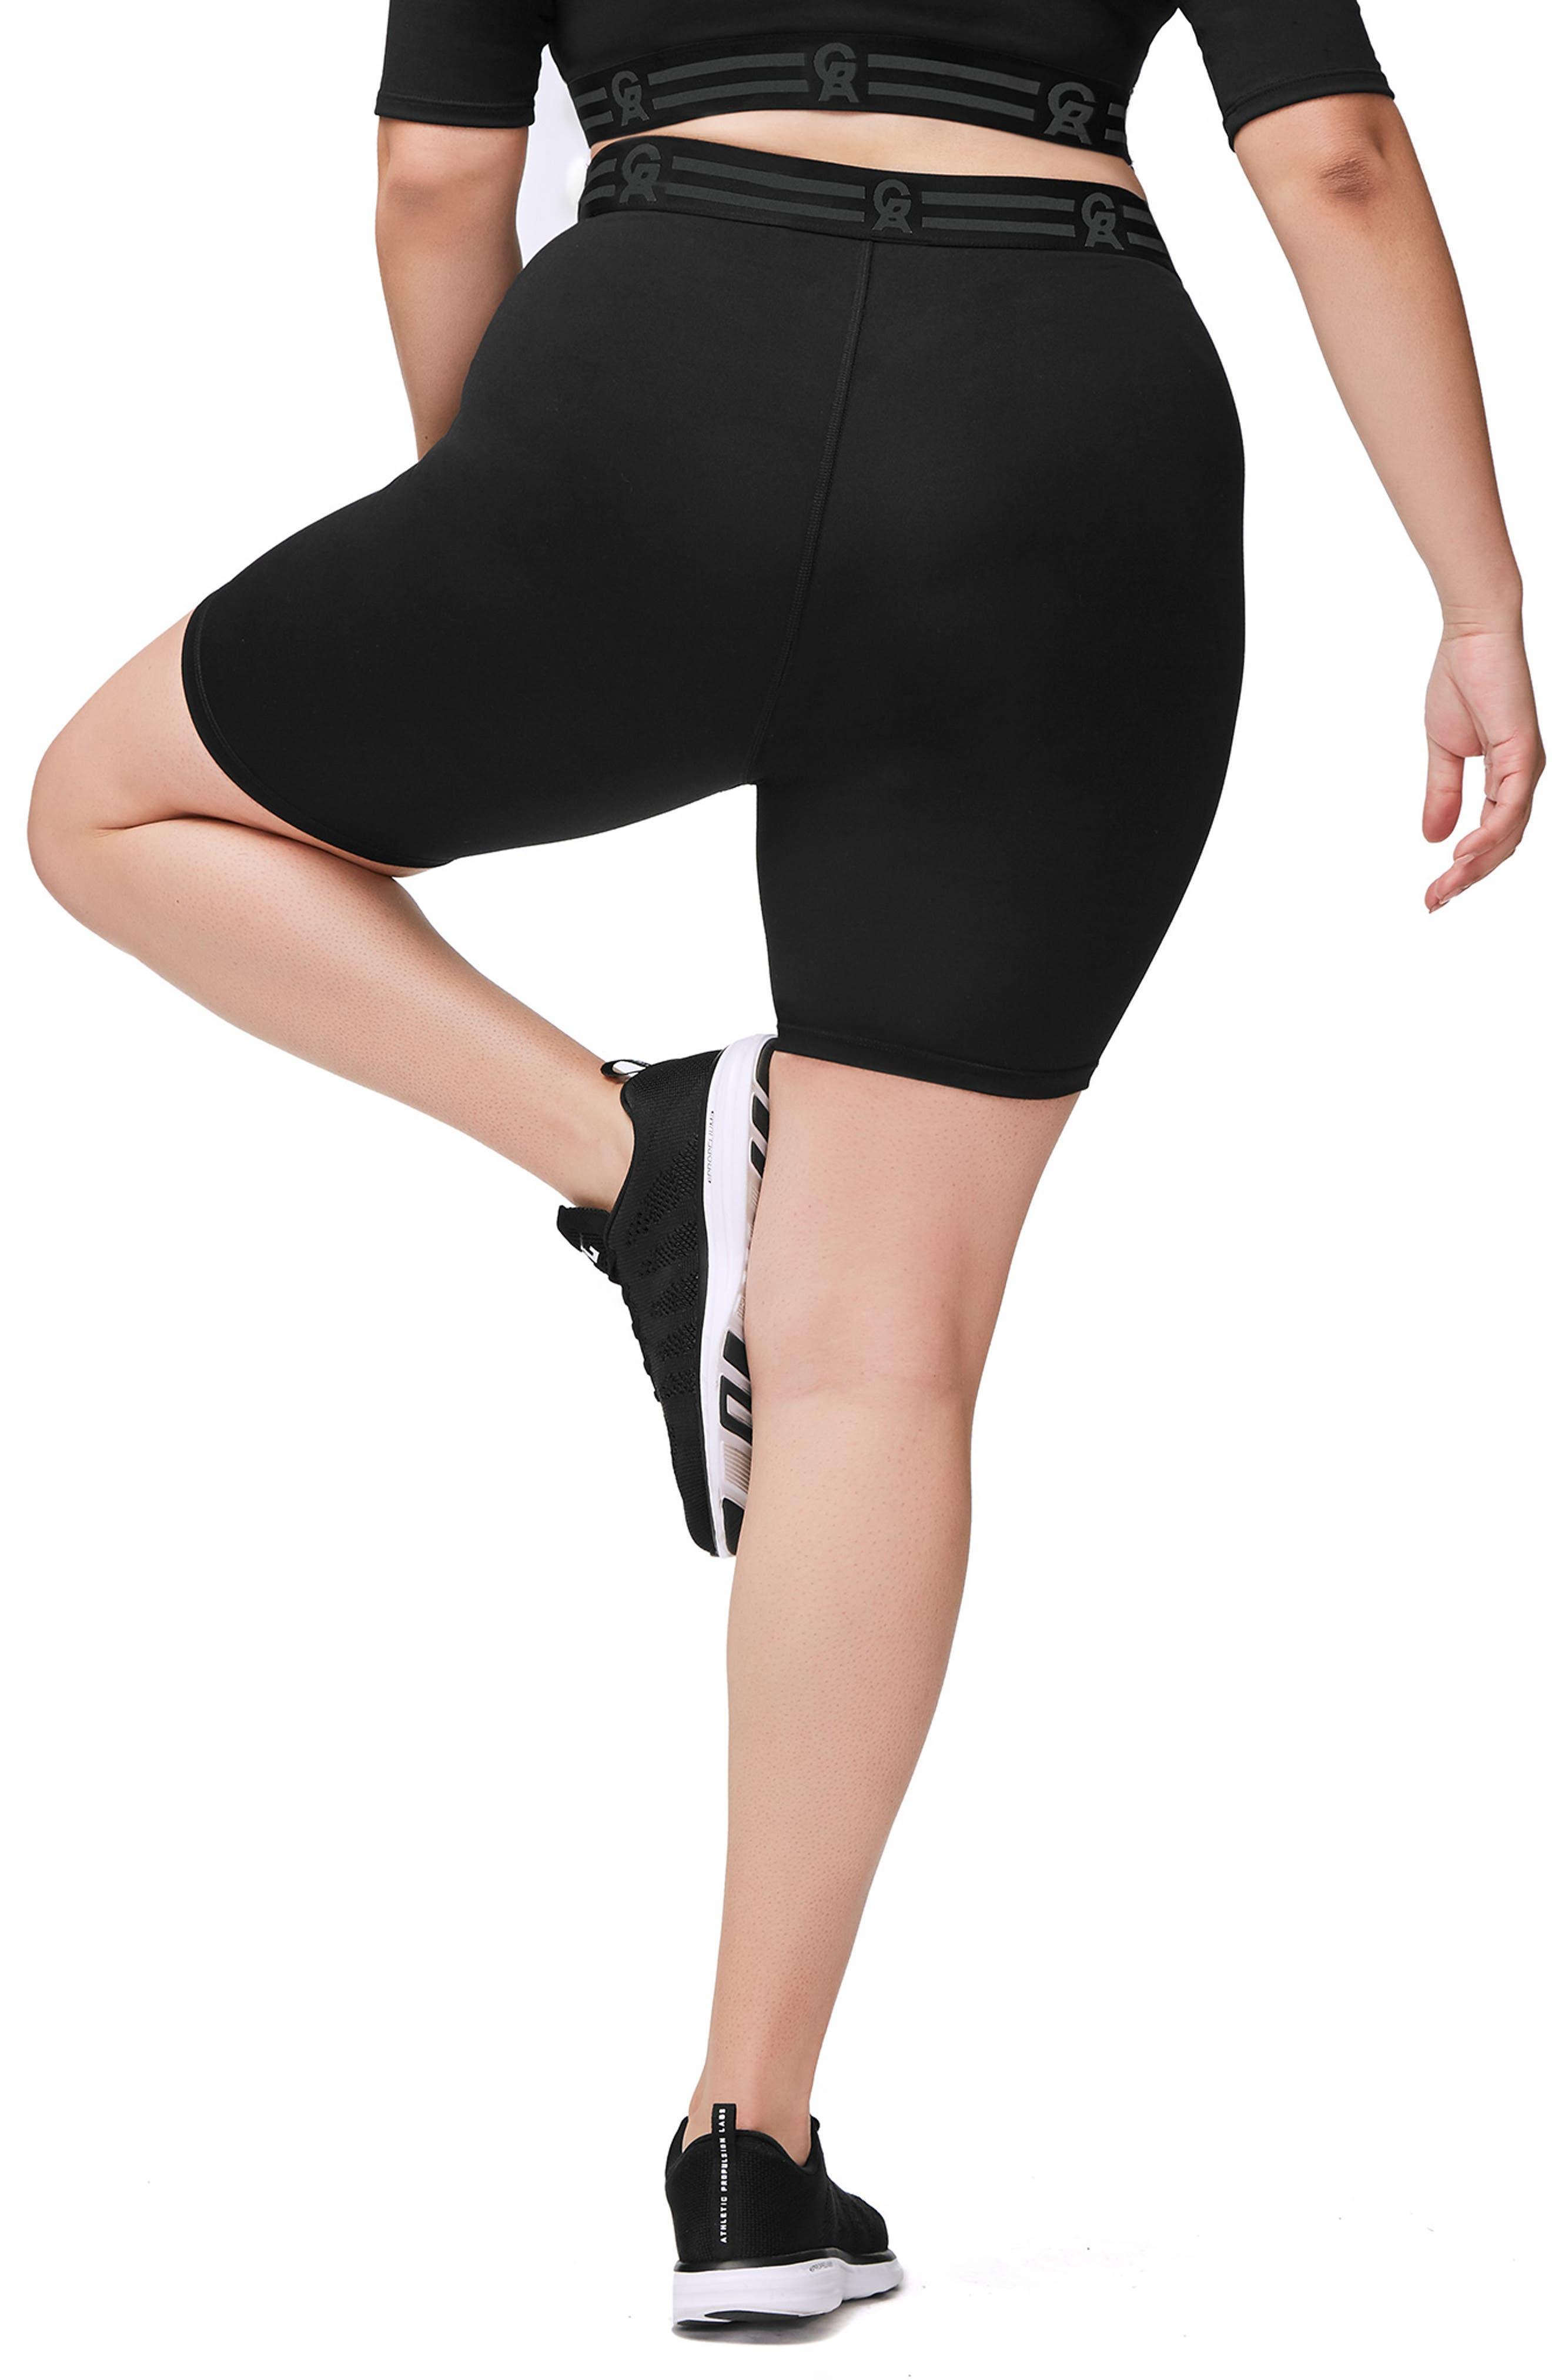 Icon High Waist Biker Shorts,                             Alternate thumbnail 6, color,                             BLACK001